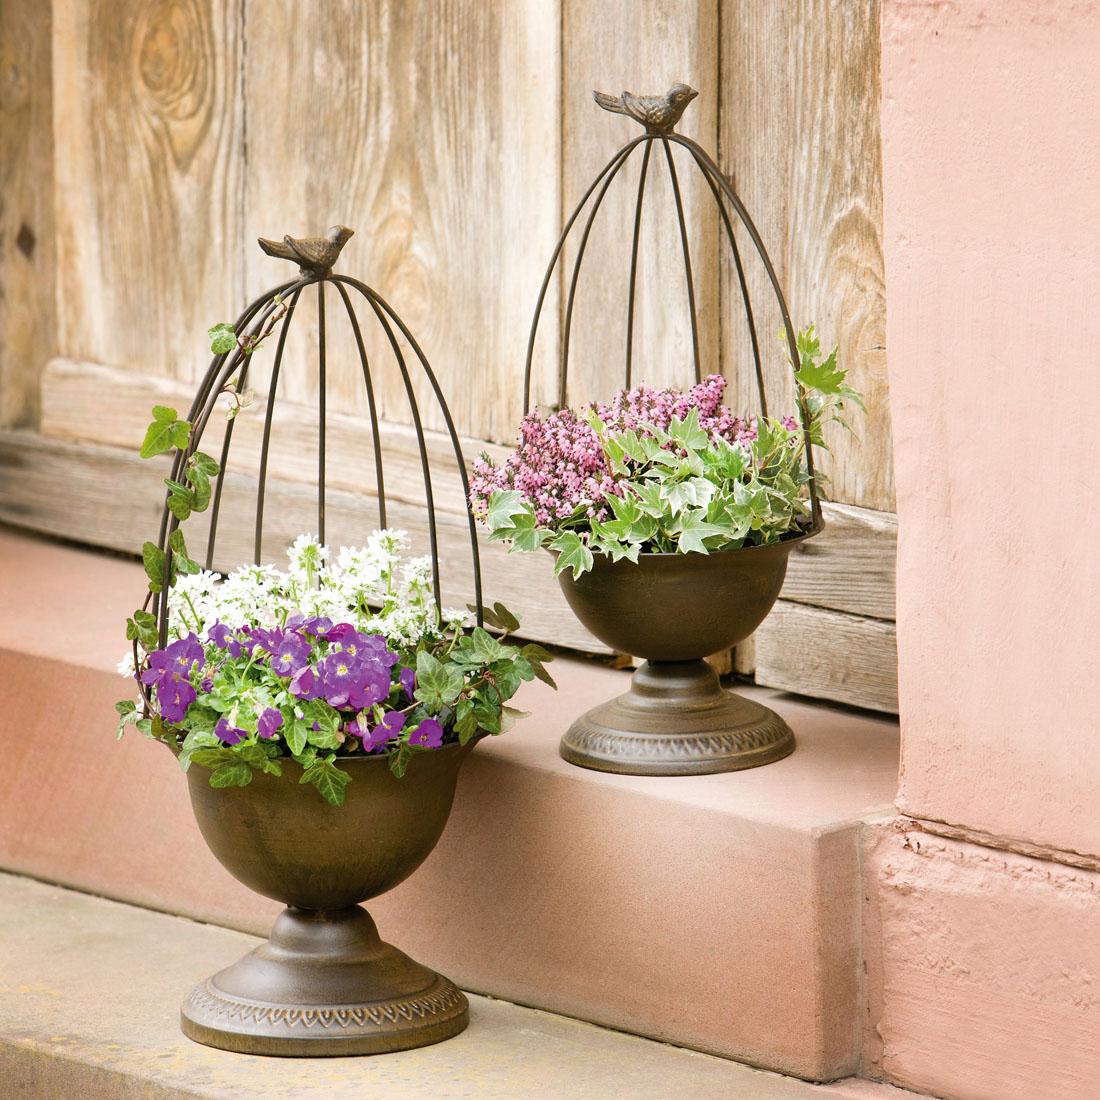 "Кашпо-опора для цветов ""Птички"", 2 штуки [07554],"